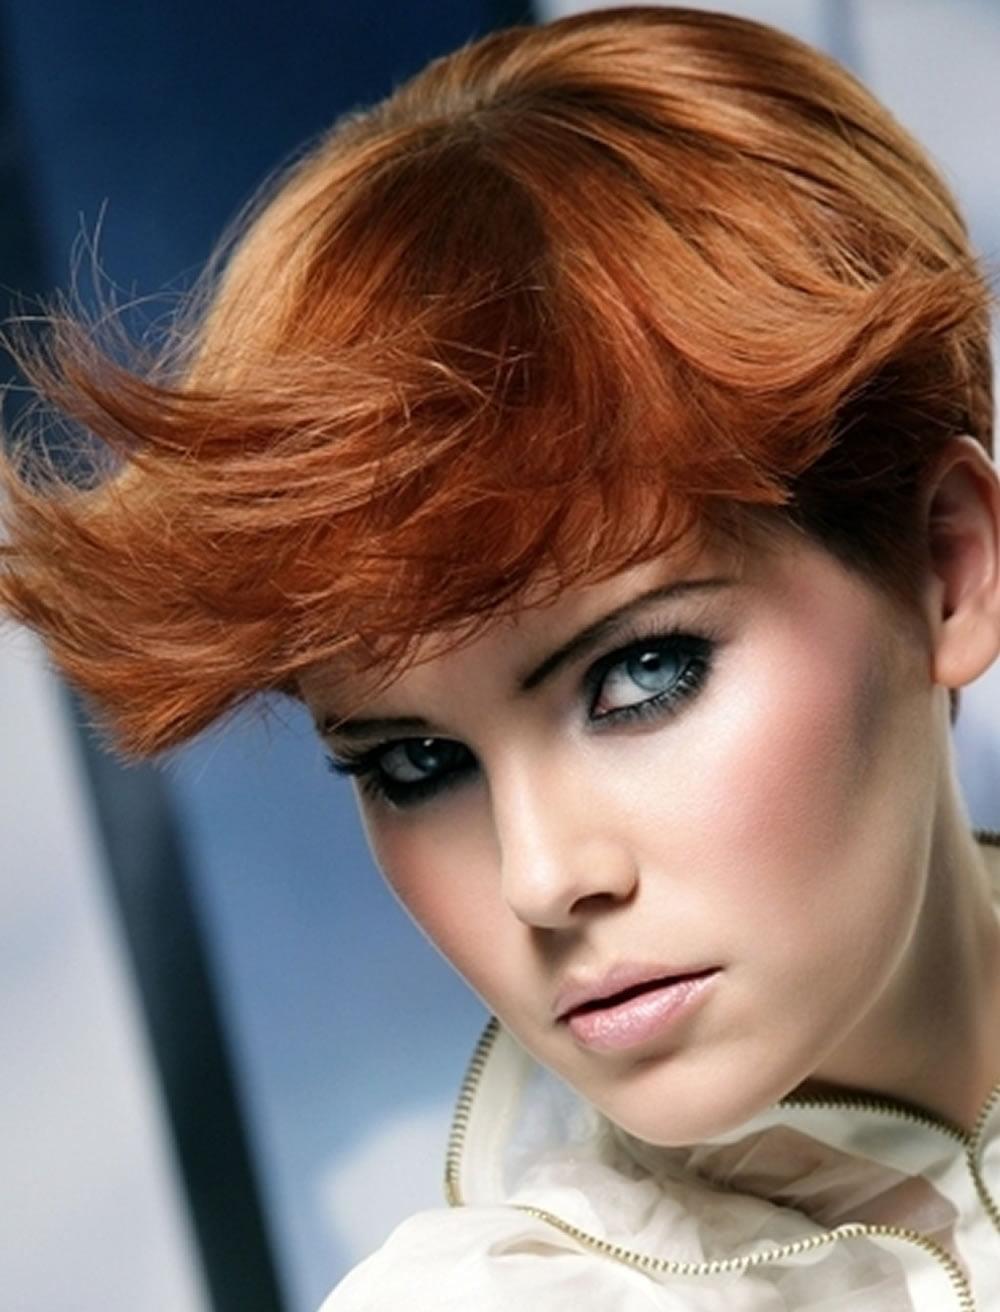 Short Hair Ideas for Women 2018